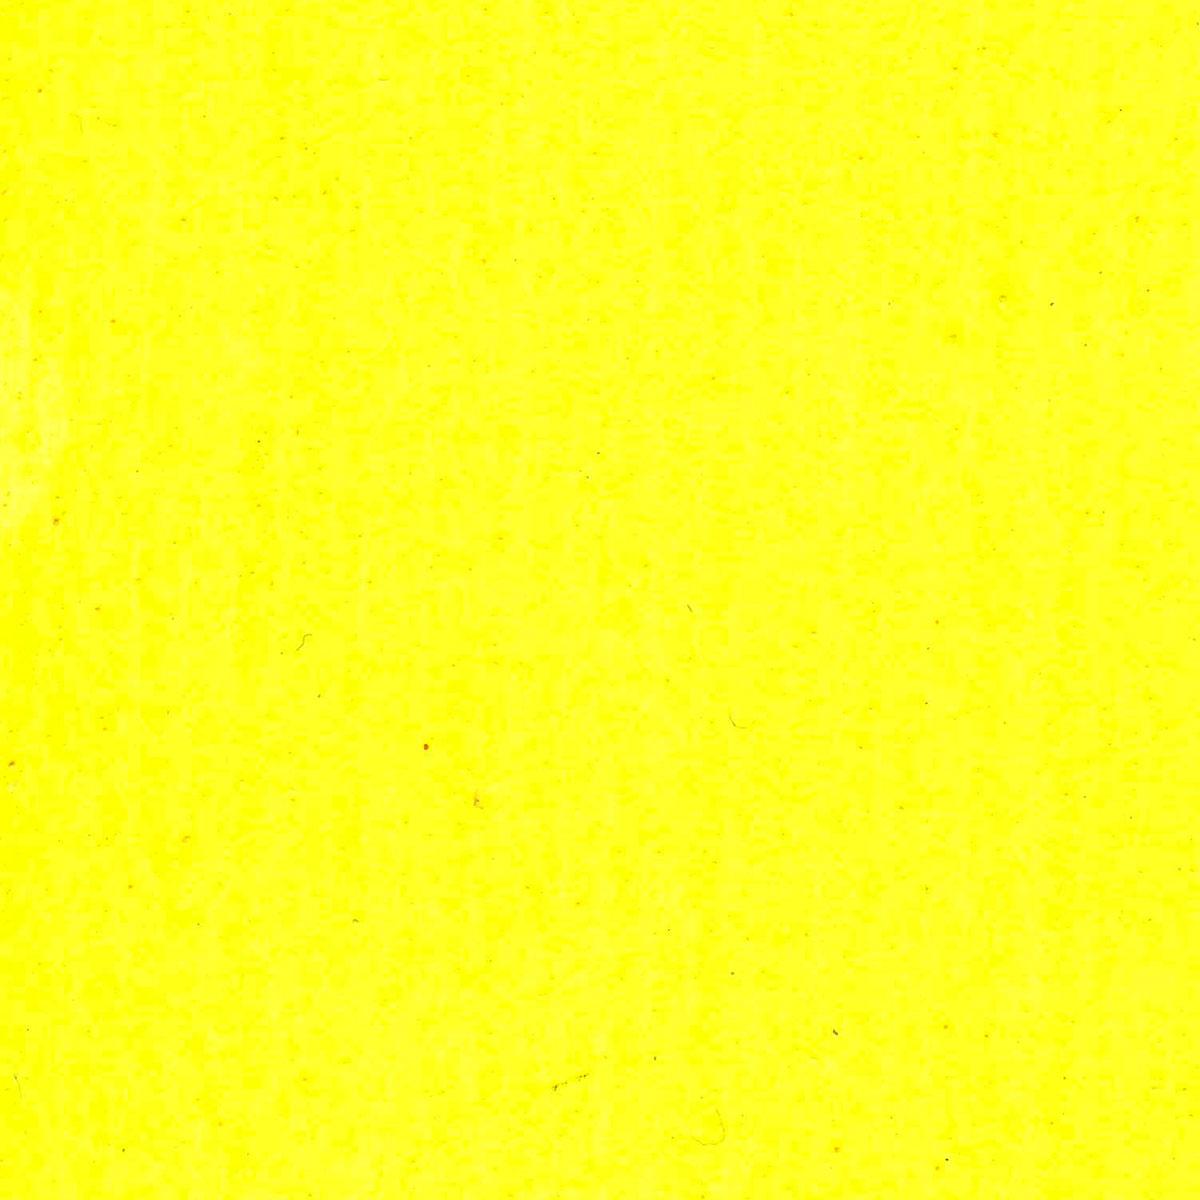 Yellow/Black SMX Motard 125cc